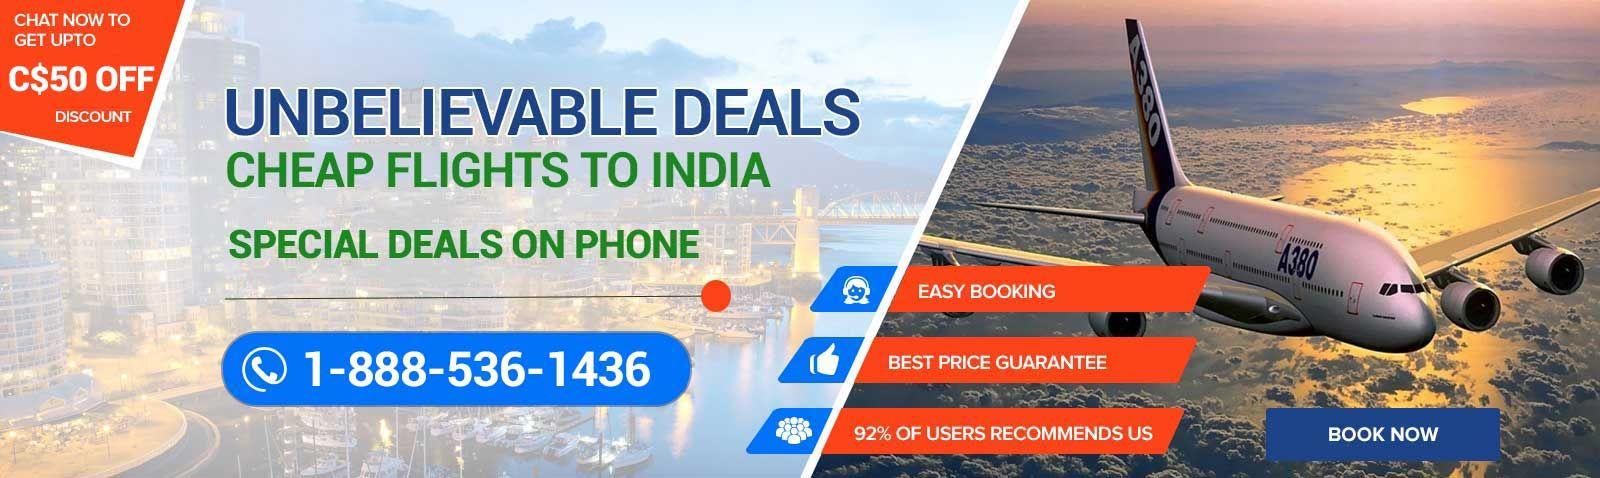 Get unbelievable #travel deals at tripbeam.